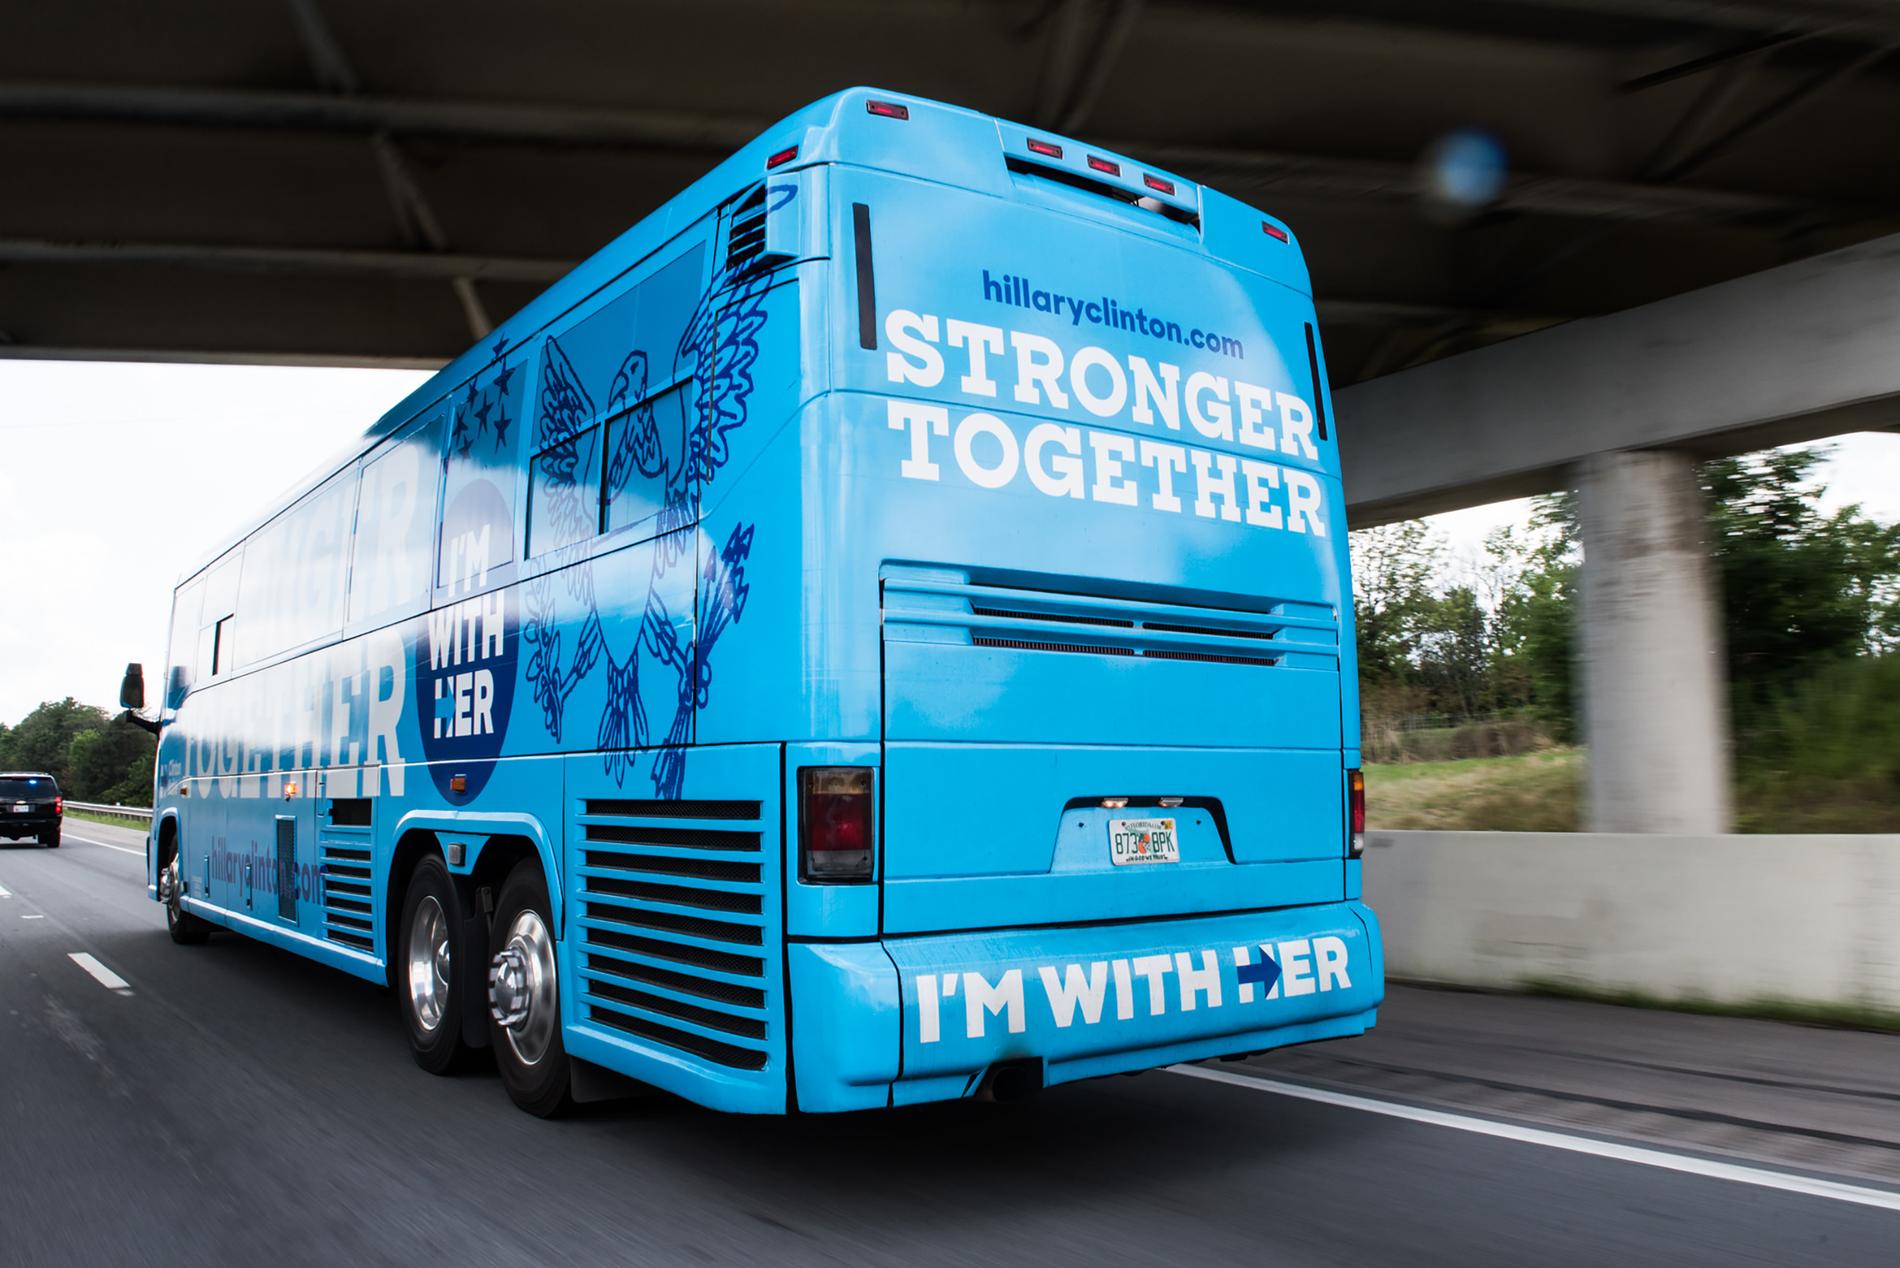 Hillary Clinton Sharp Slab Bus Image 2